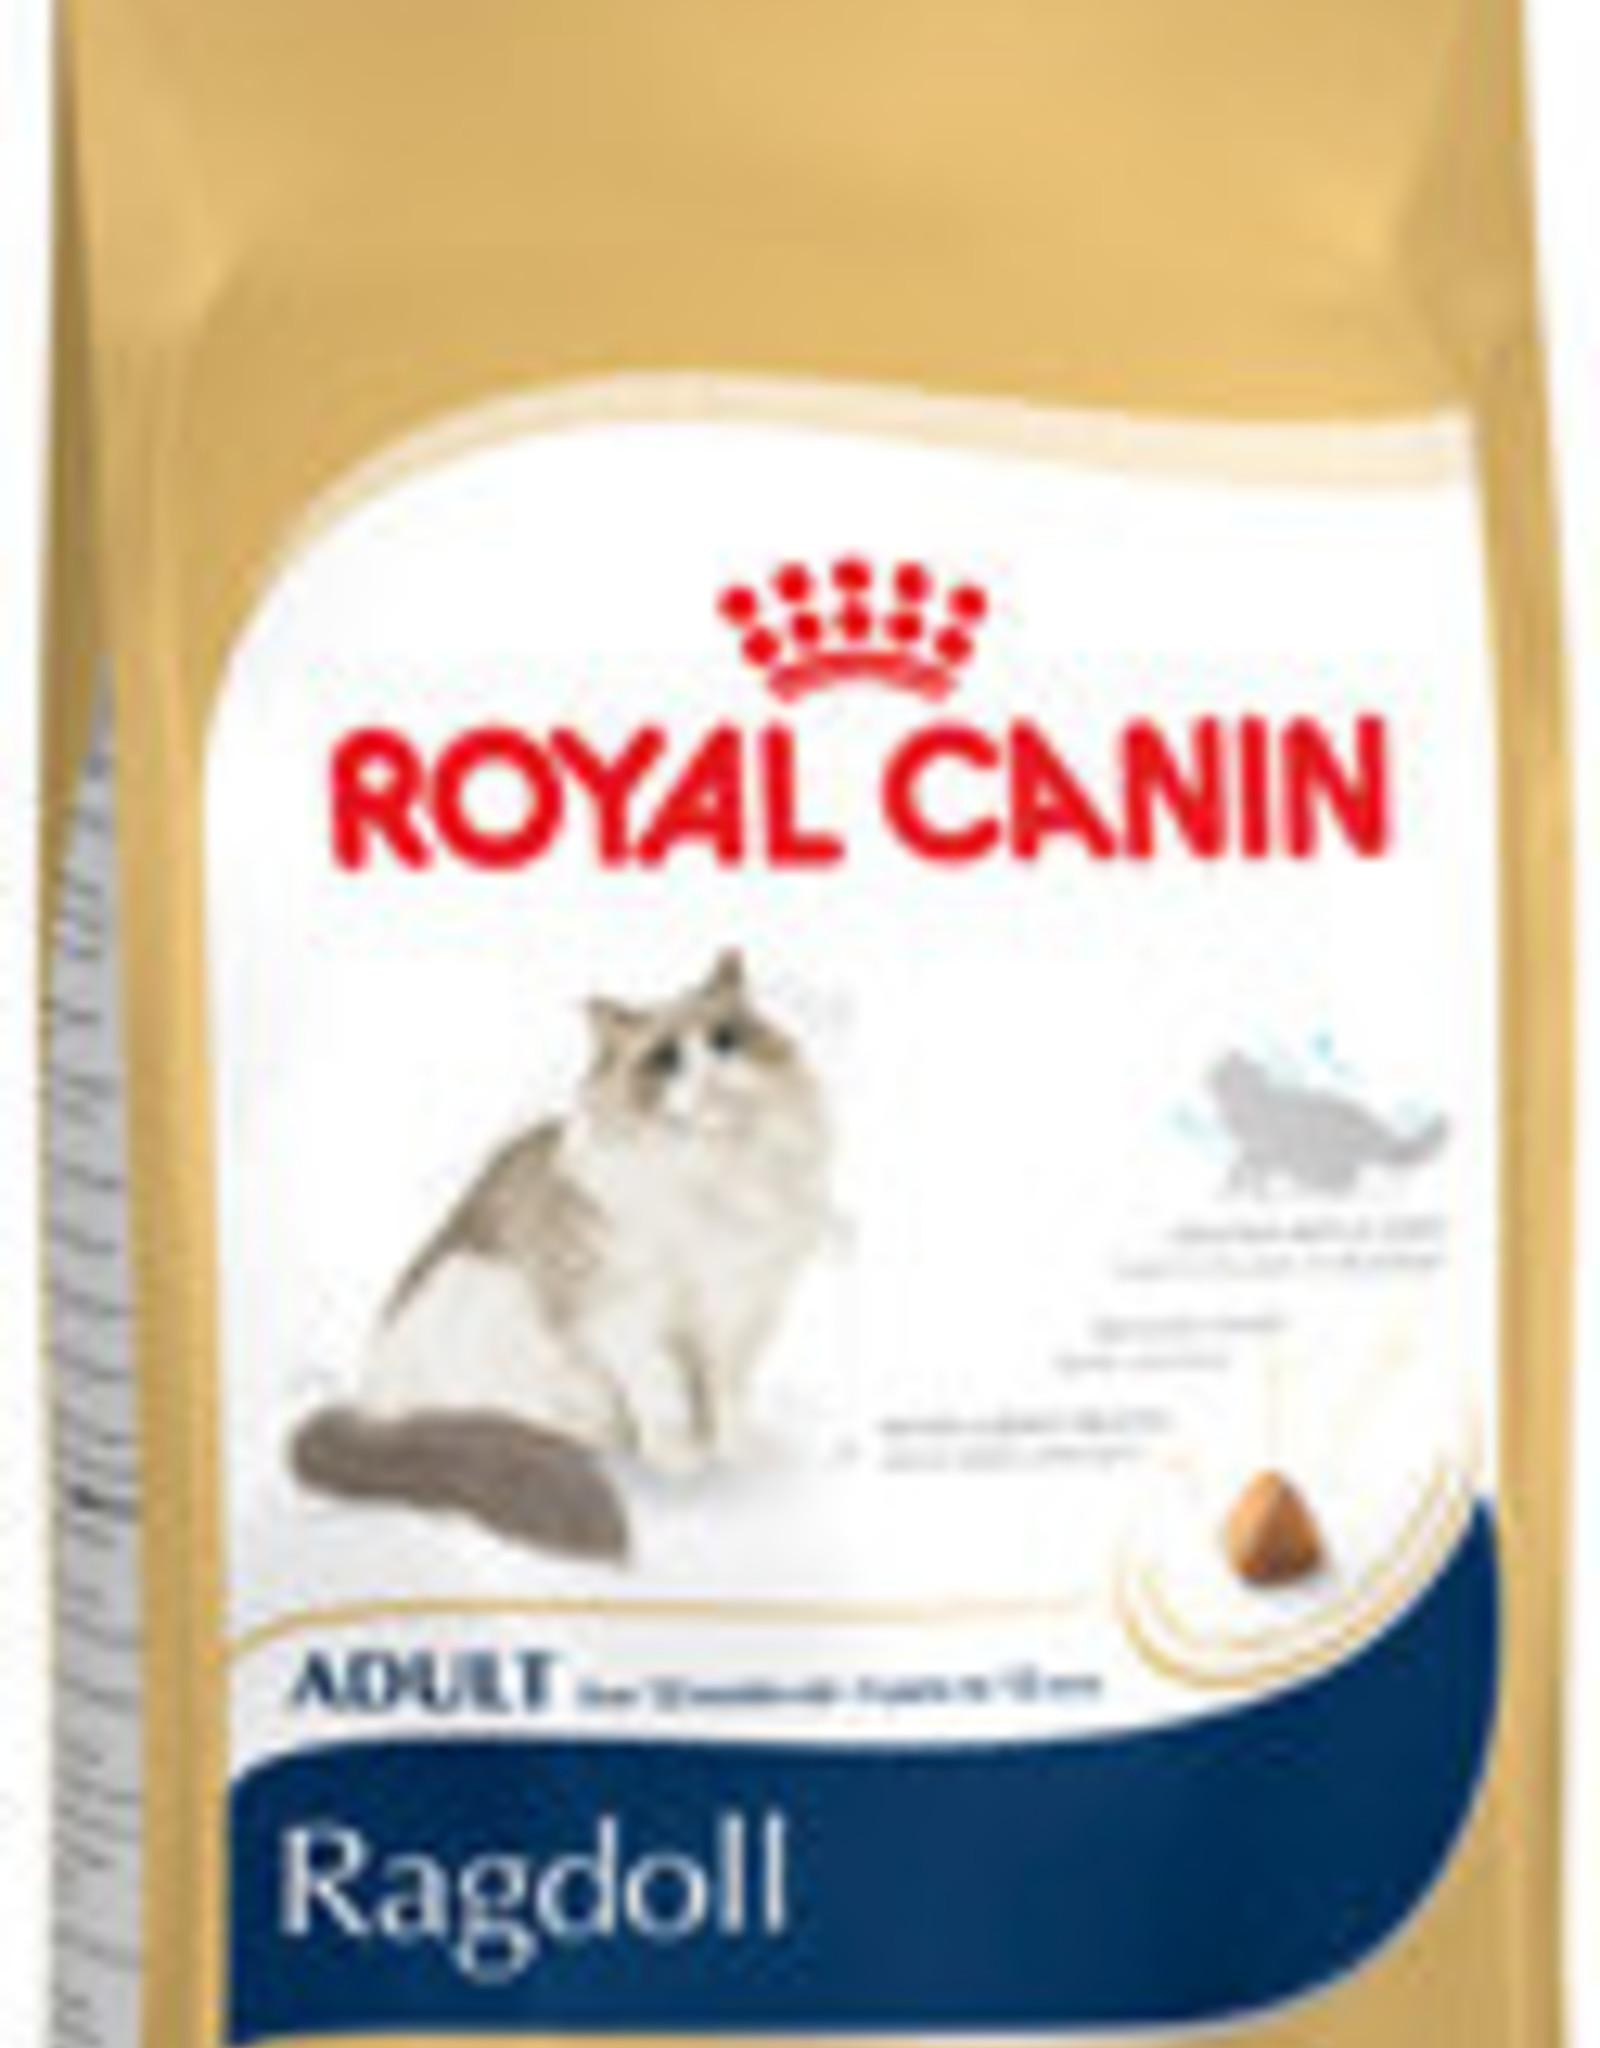 Royal Canin Royal Canin Fbn Ragdoll 2kg